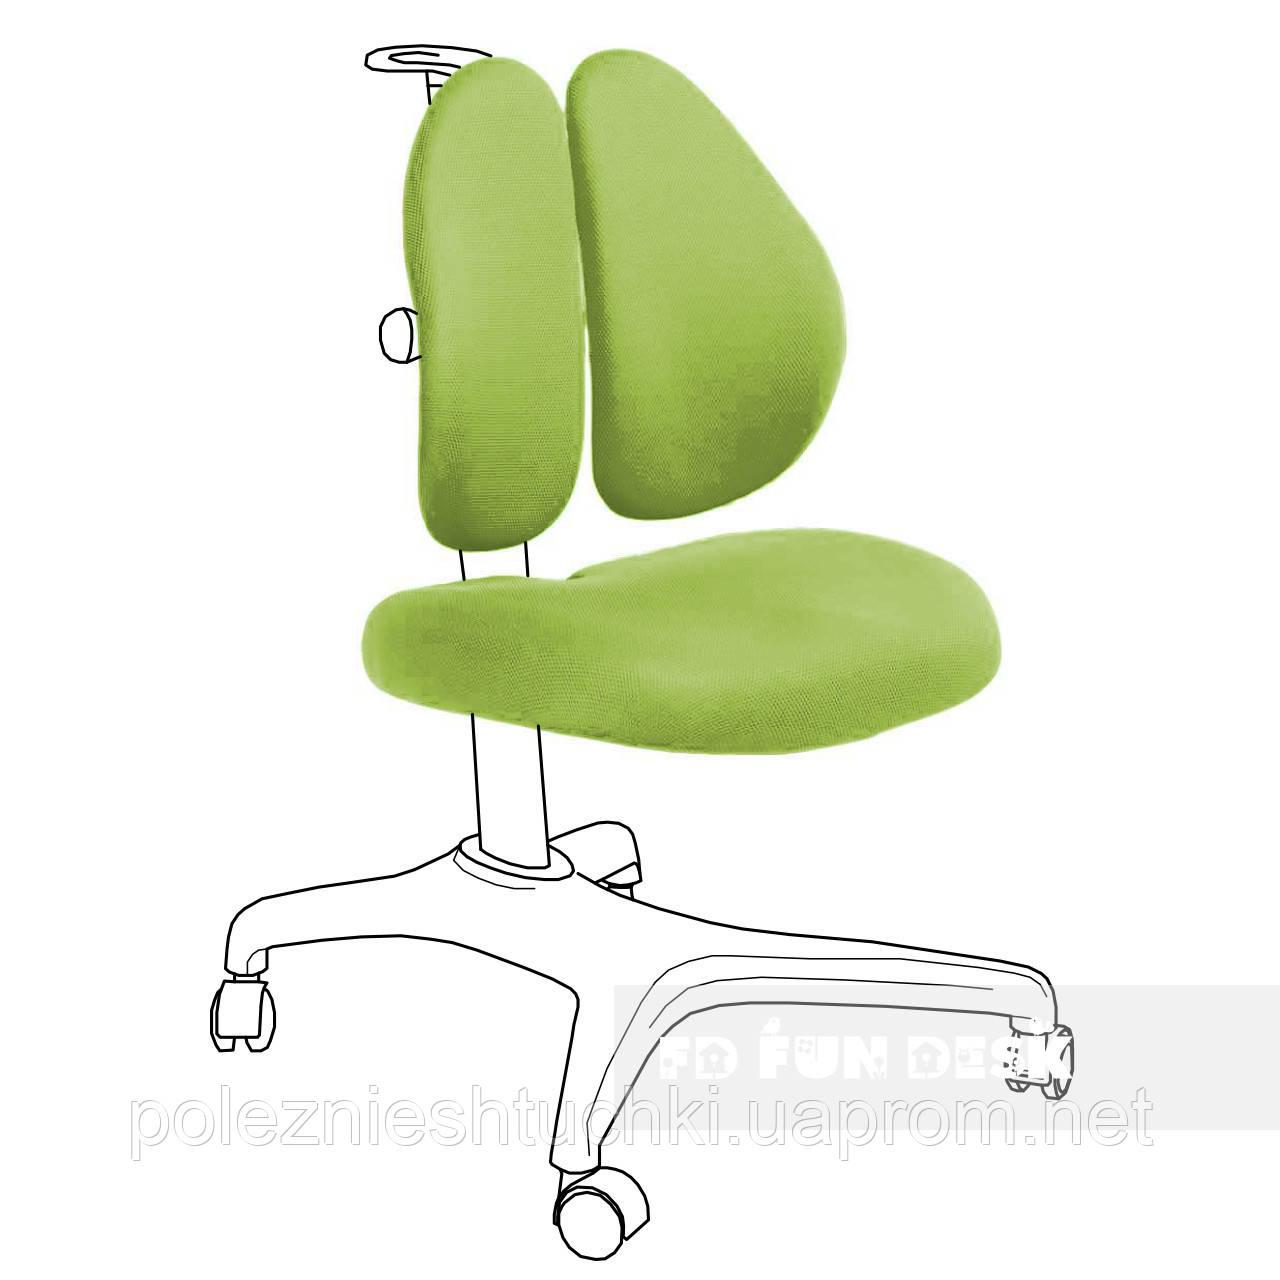 Чехол для кресла Bello II green